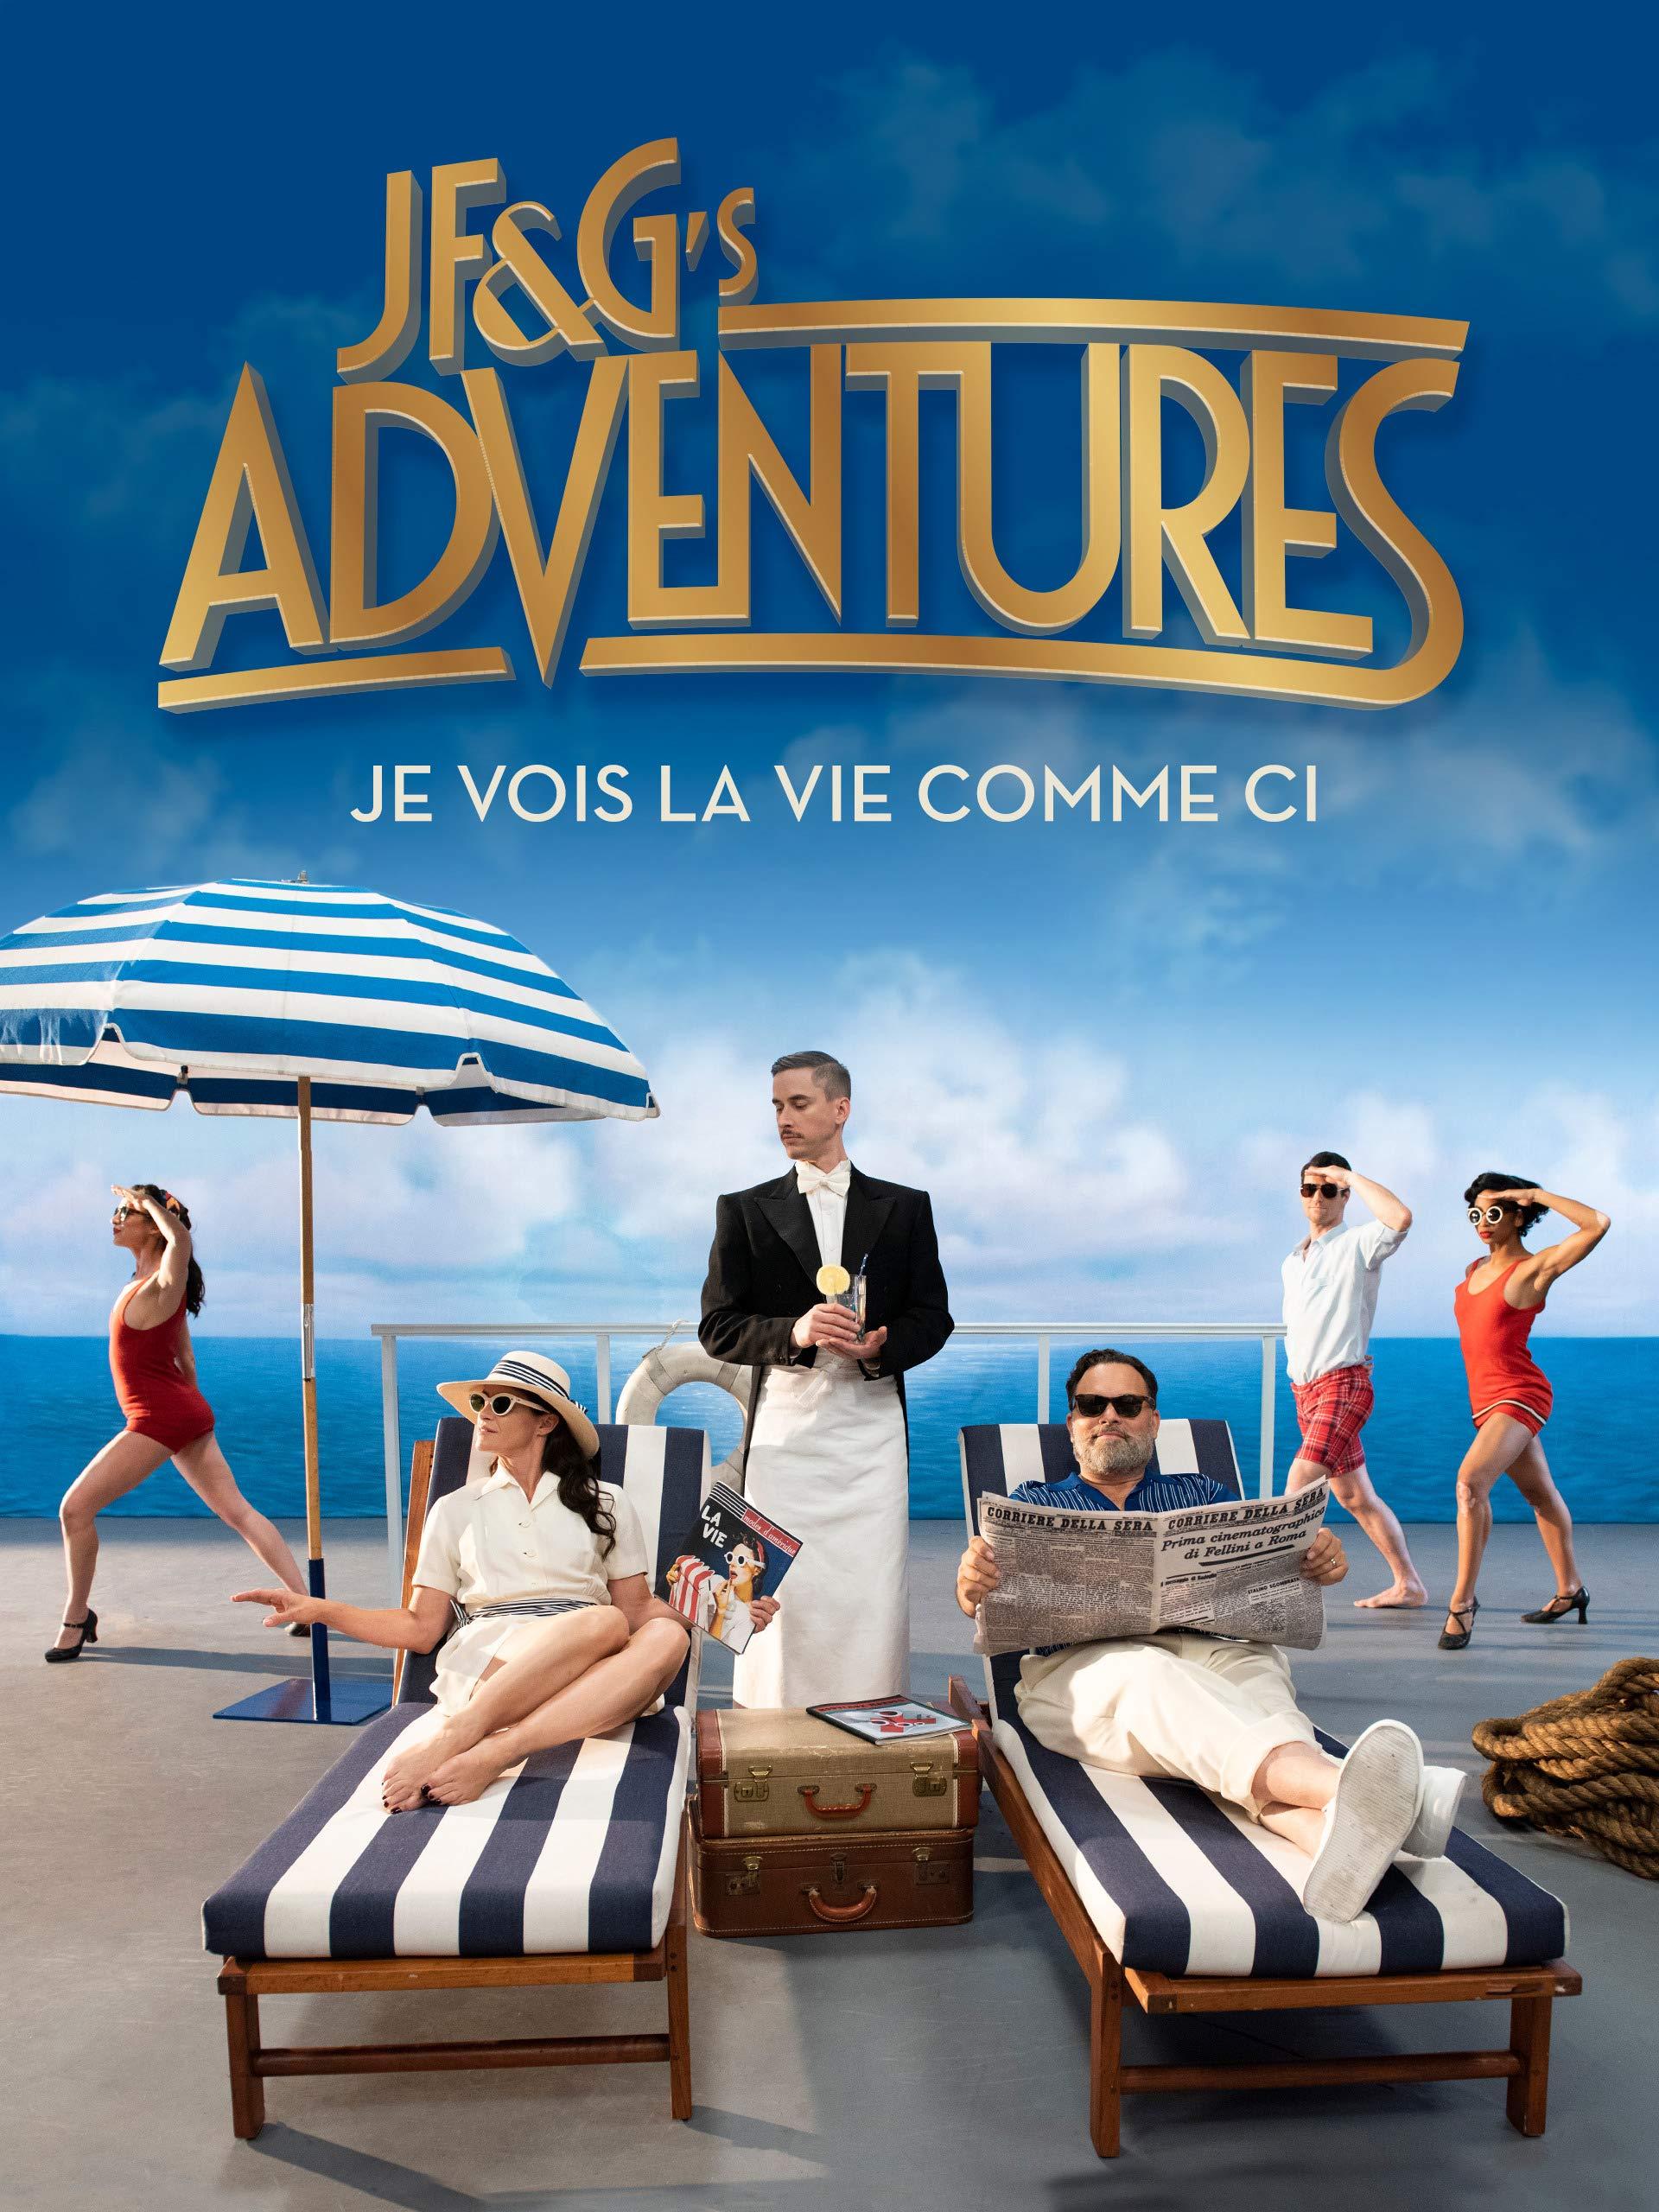 JF&G's Adventures: Je Vois La Vie Comme Ci on Amazon Prime Video UK